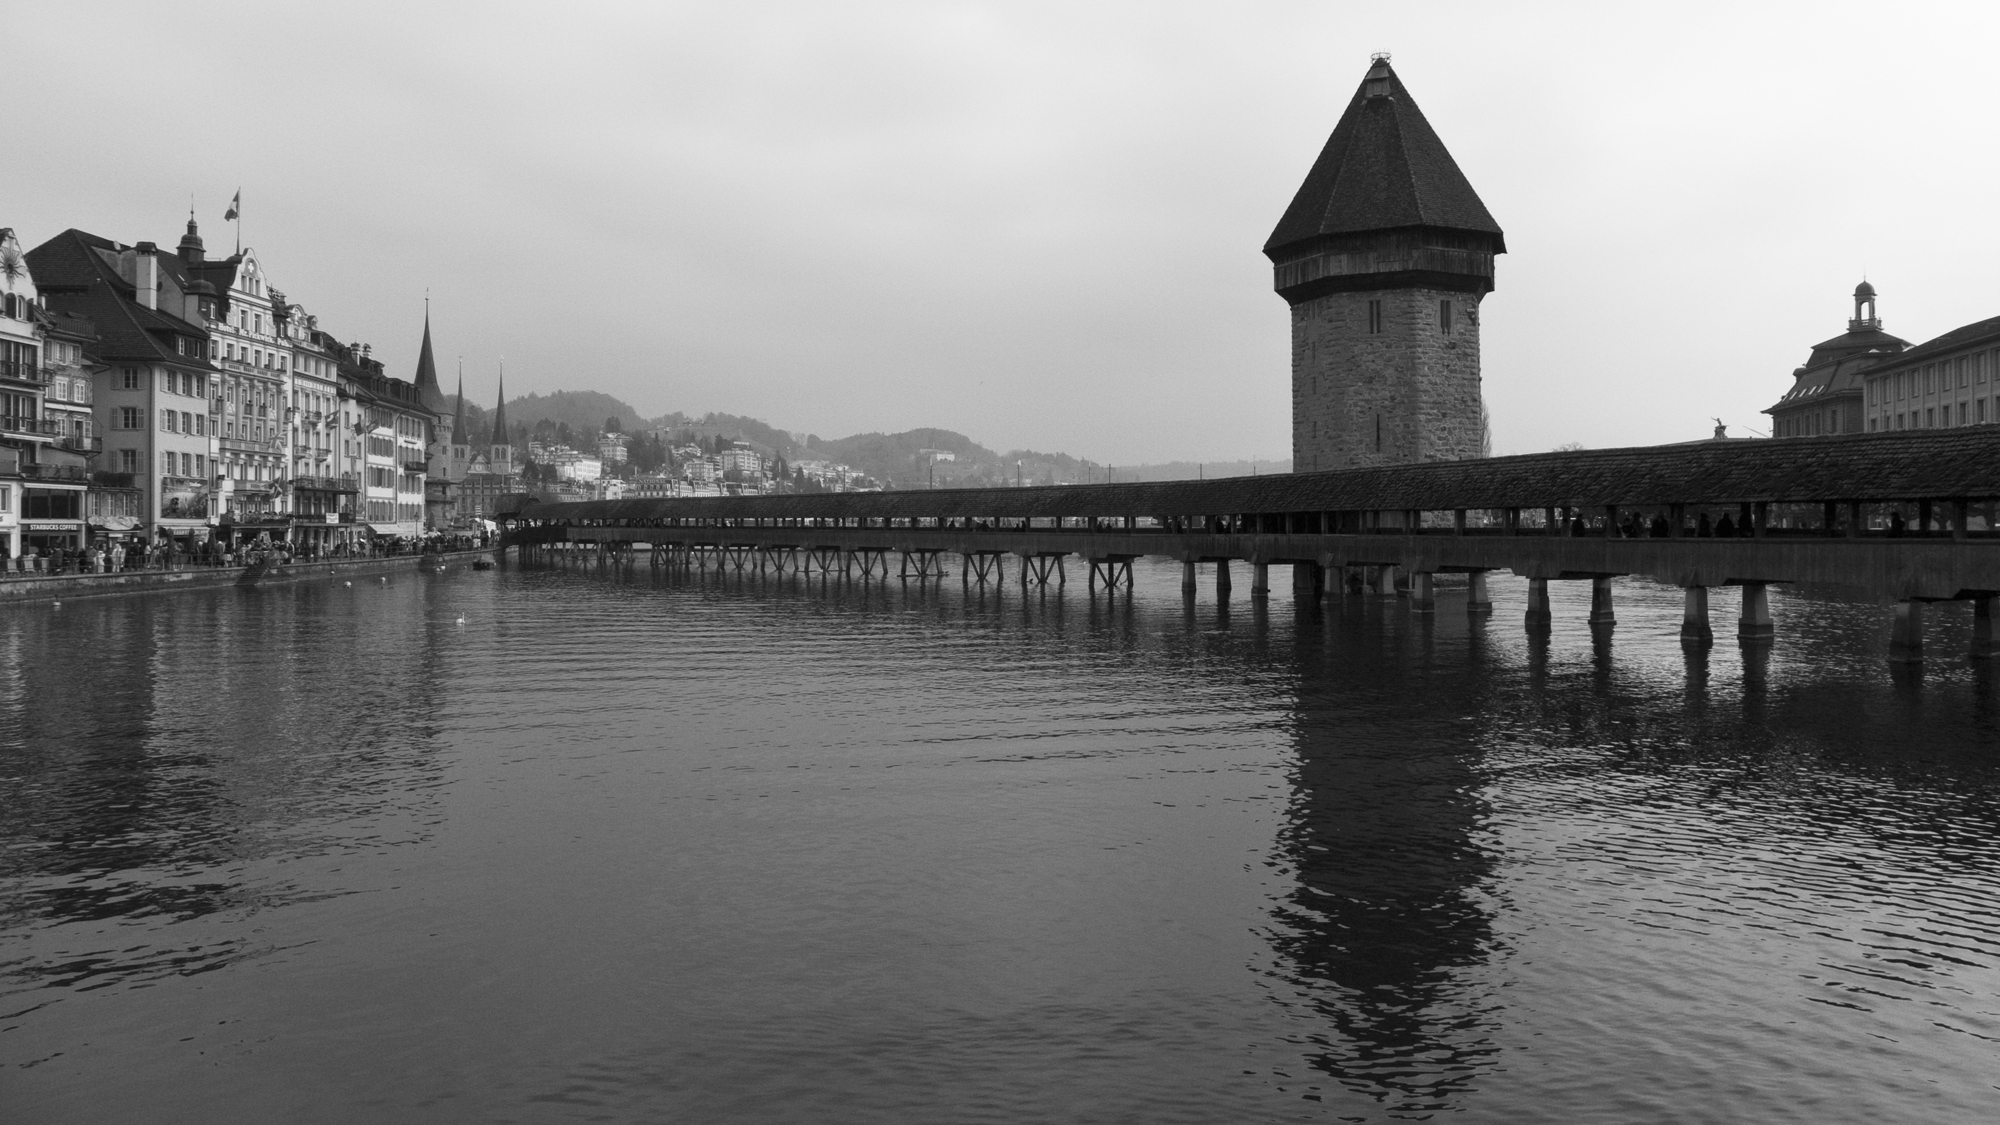 lurcerne_bridge_bw.jpg